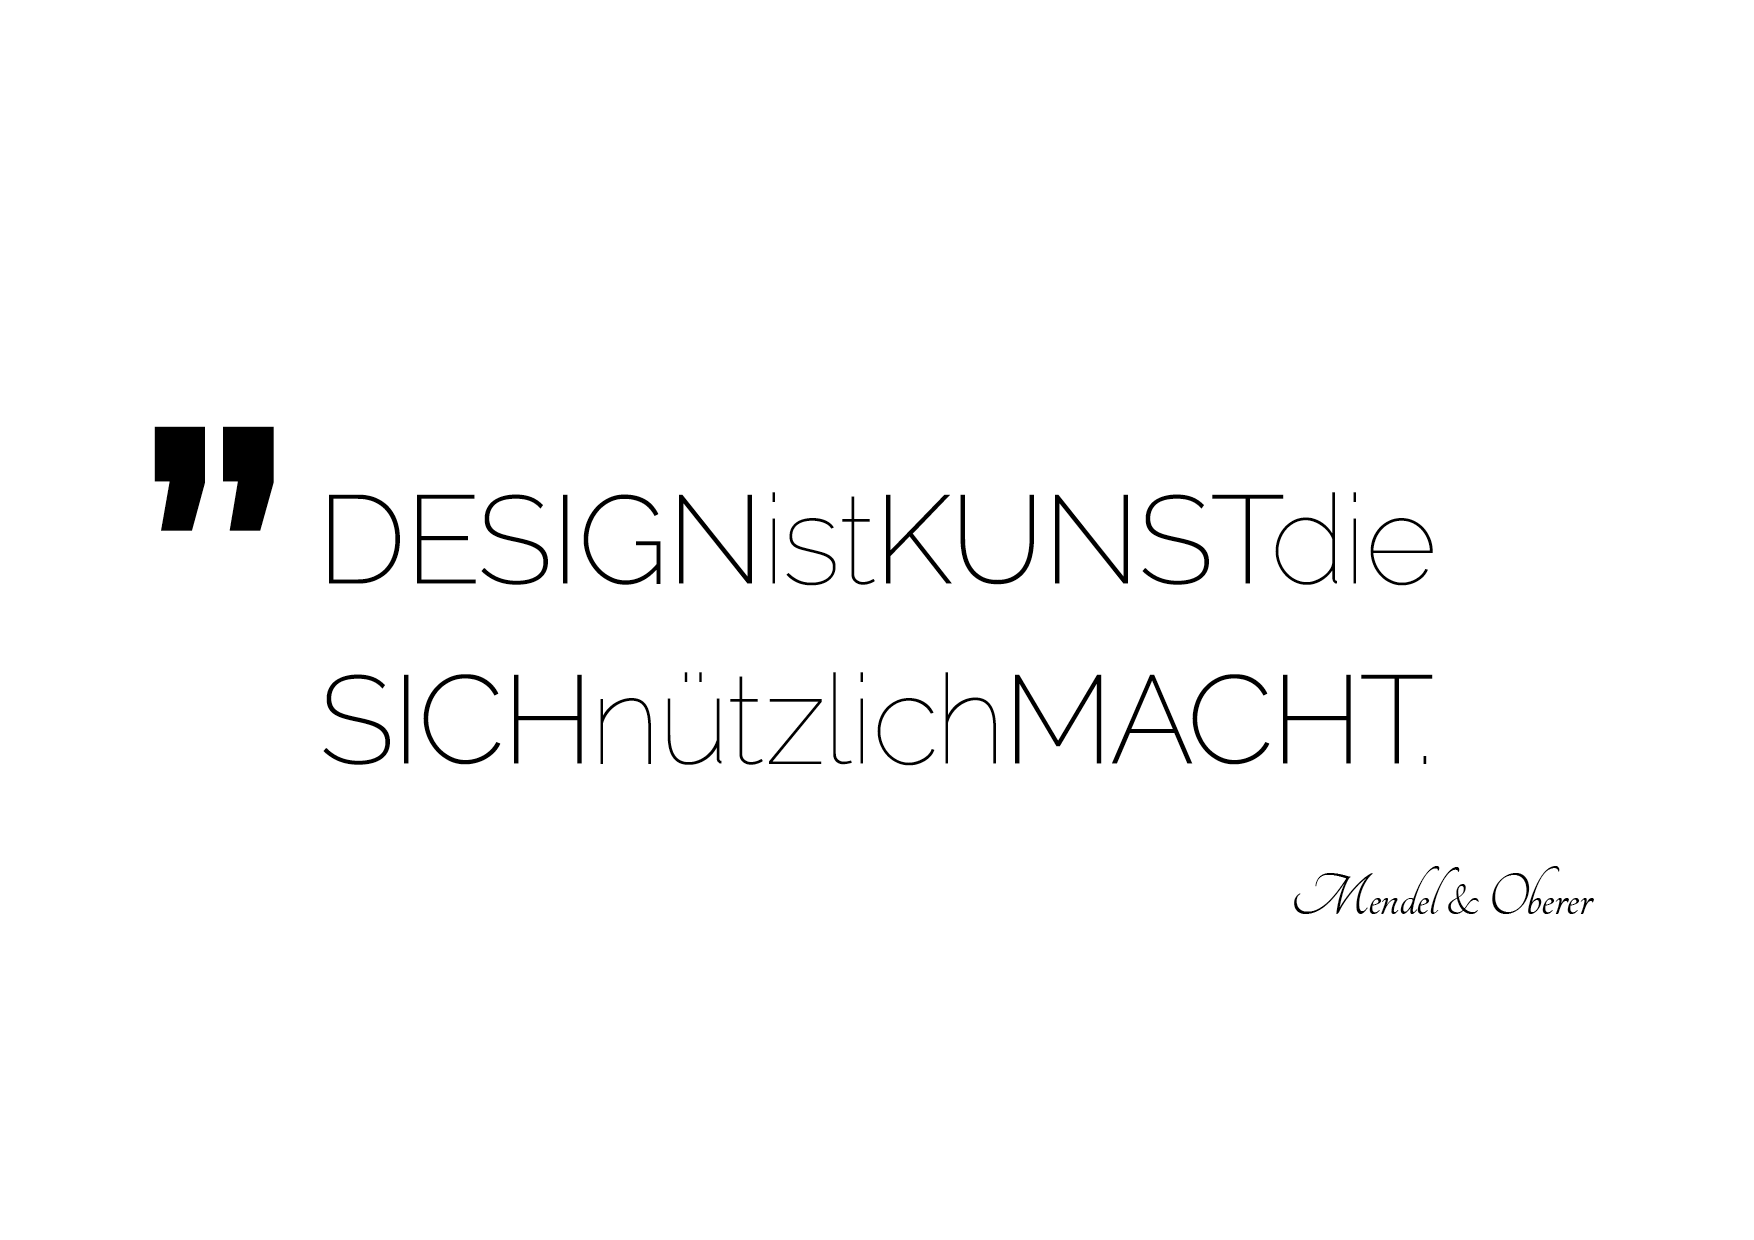 Design ist kunst design foto cornelefant - Design zitate ...